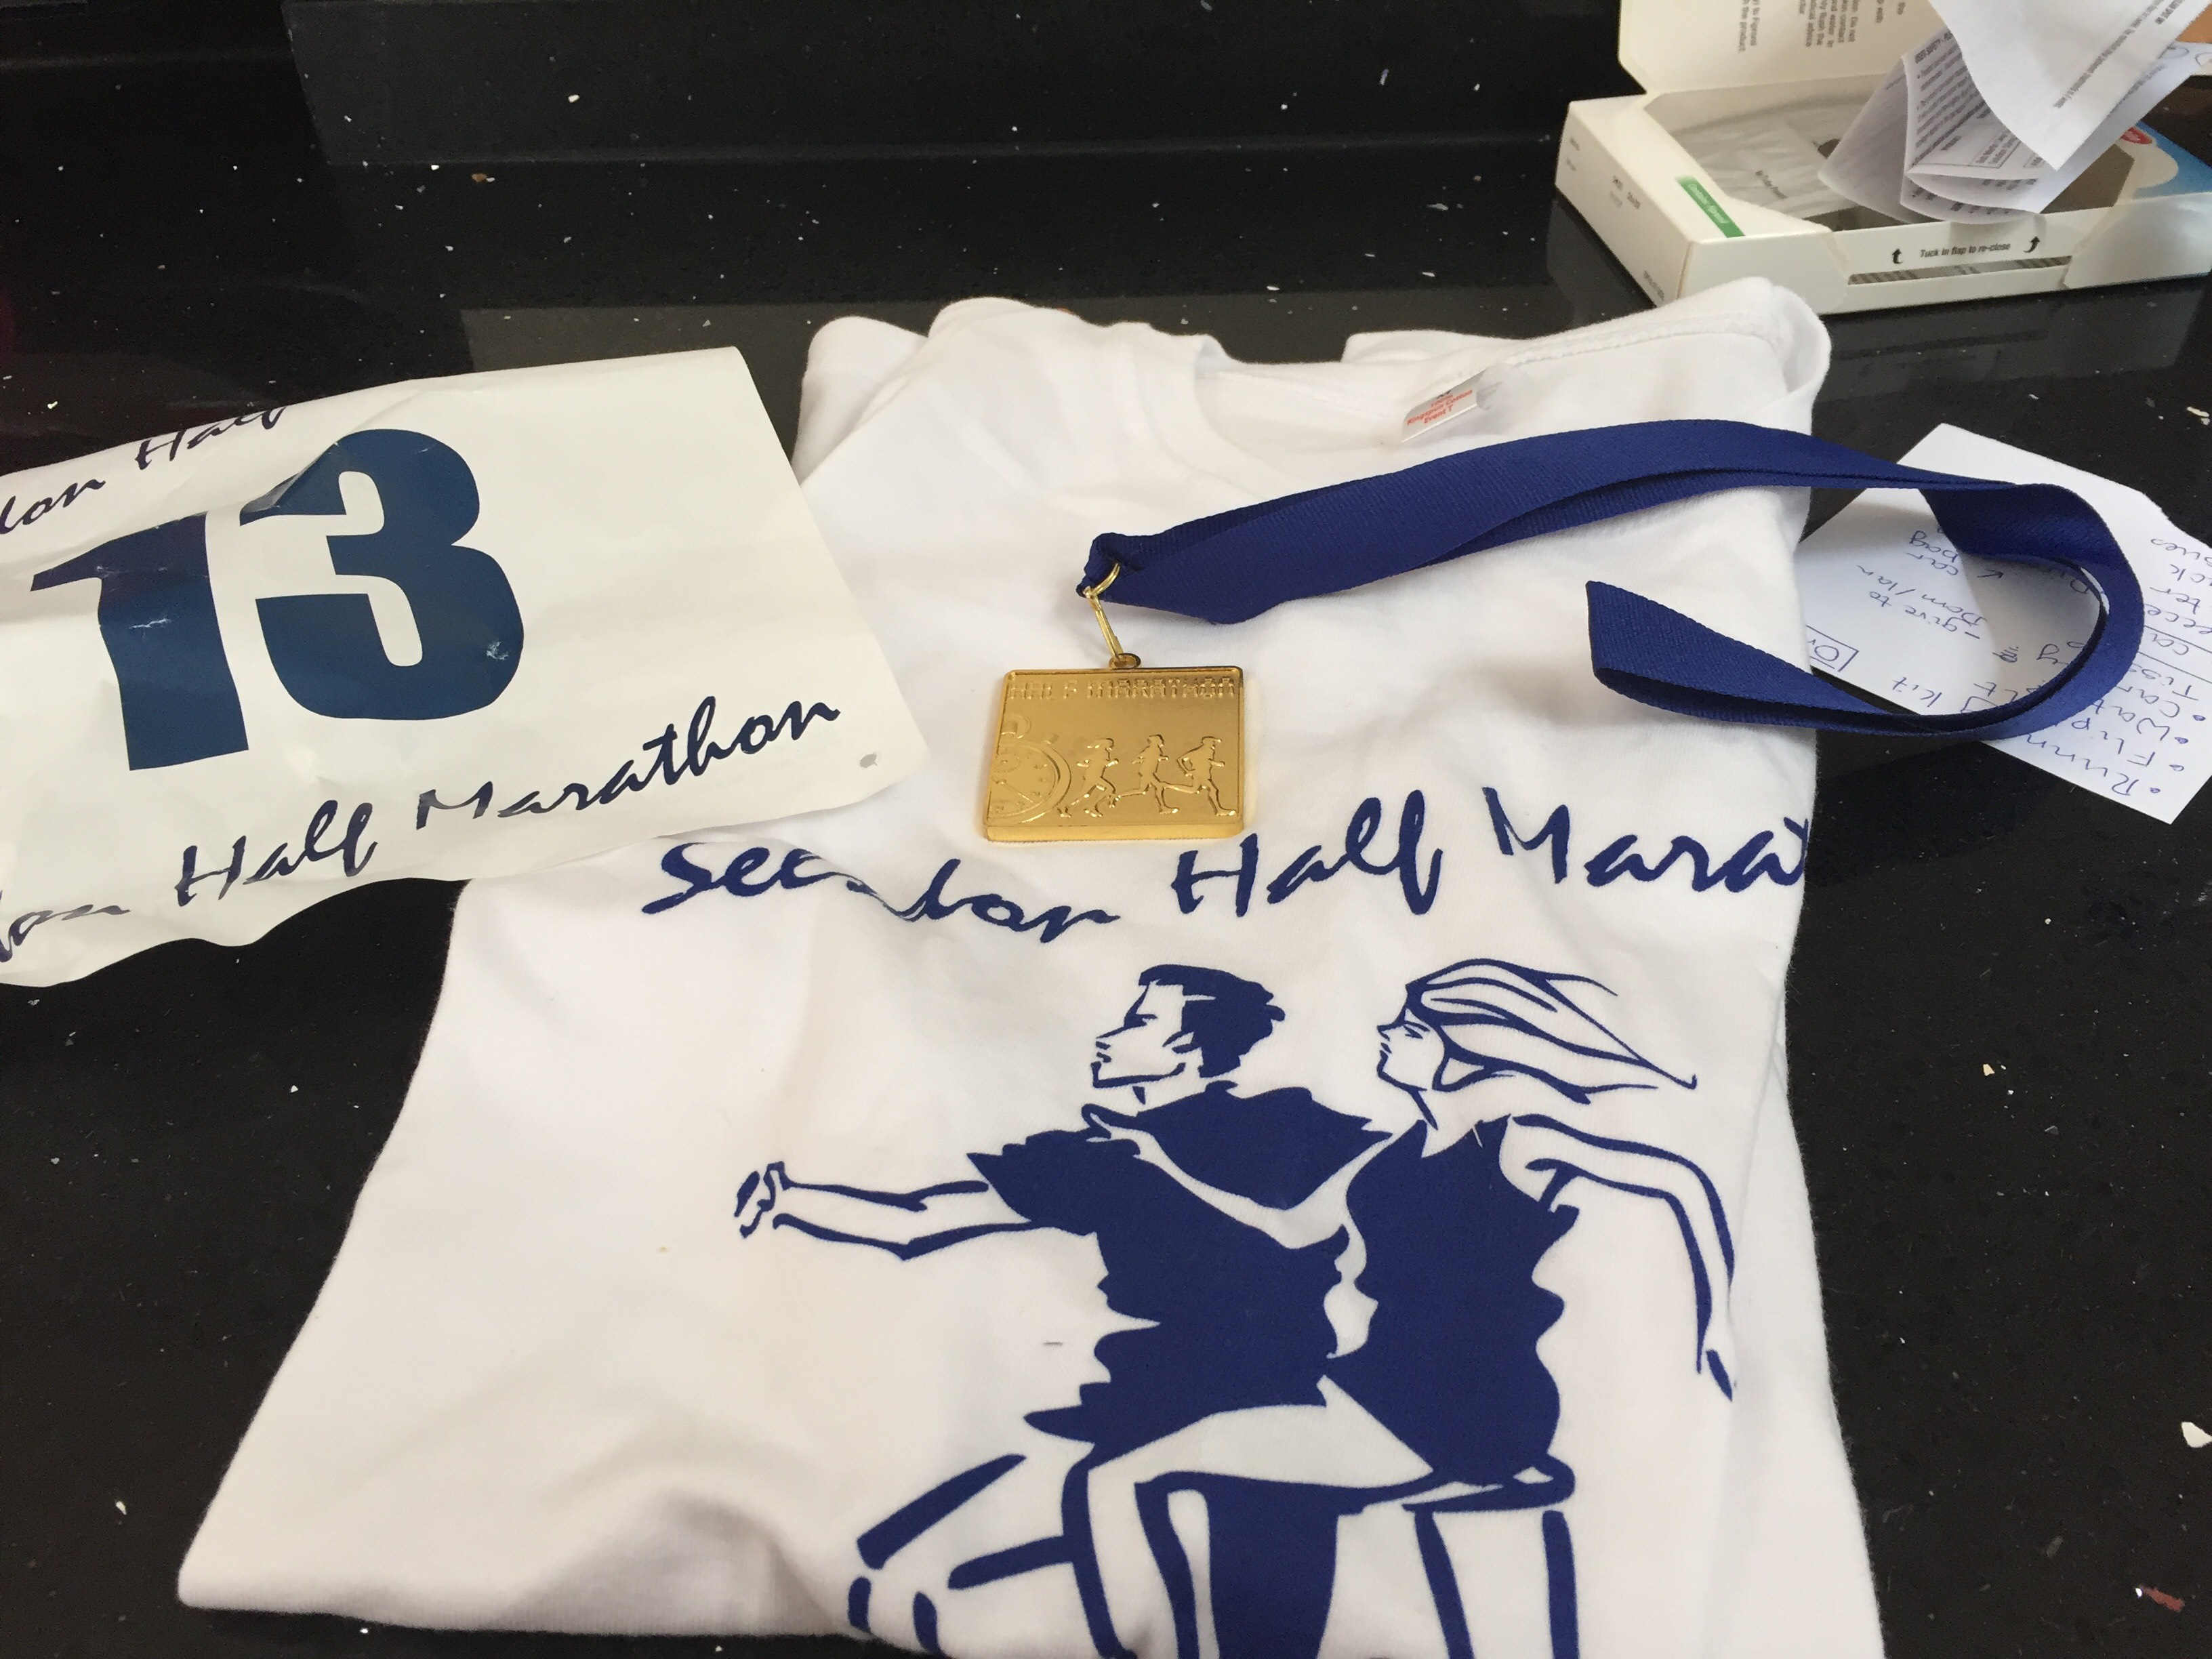 Selsdon Half Marathon - Goodgym Relay!